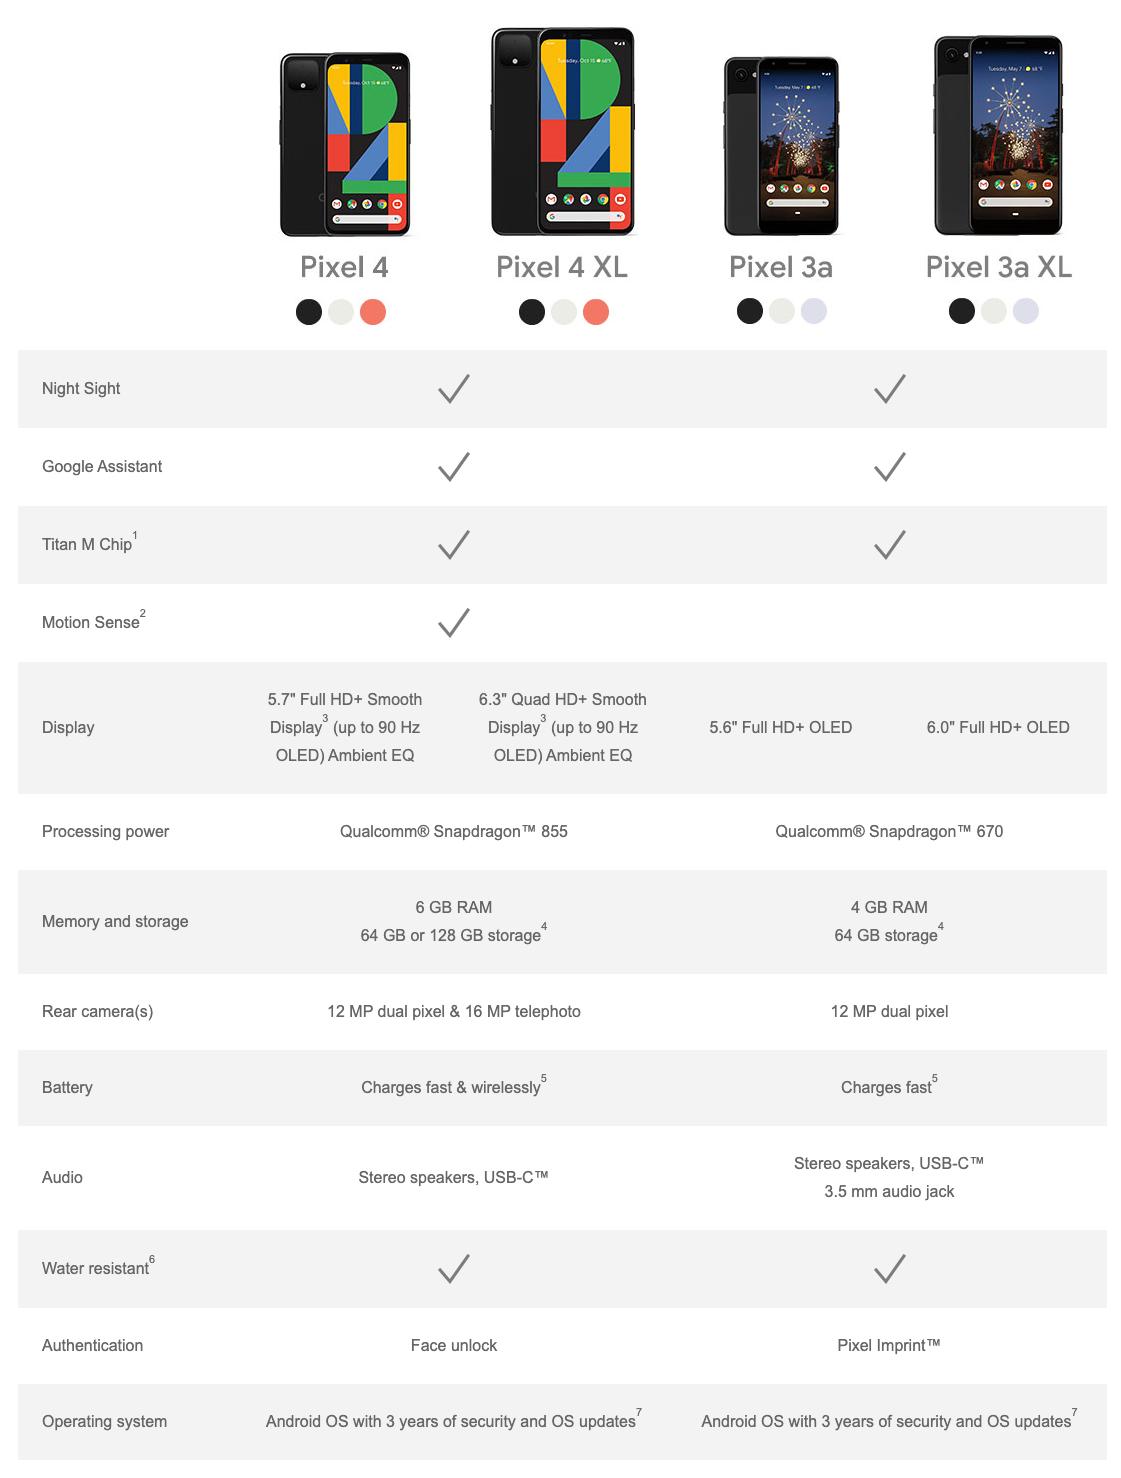 Confronto tra Google Pixel 4 e Google Pixel 4 XL